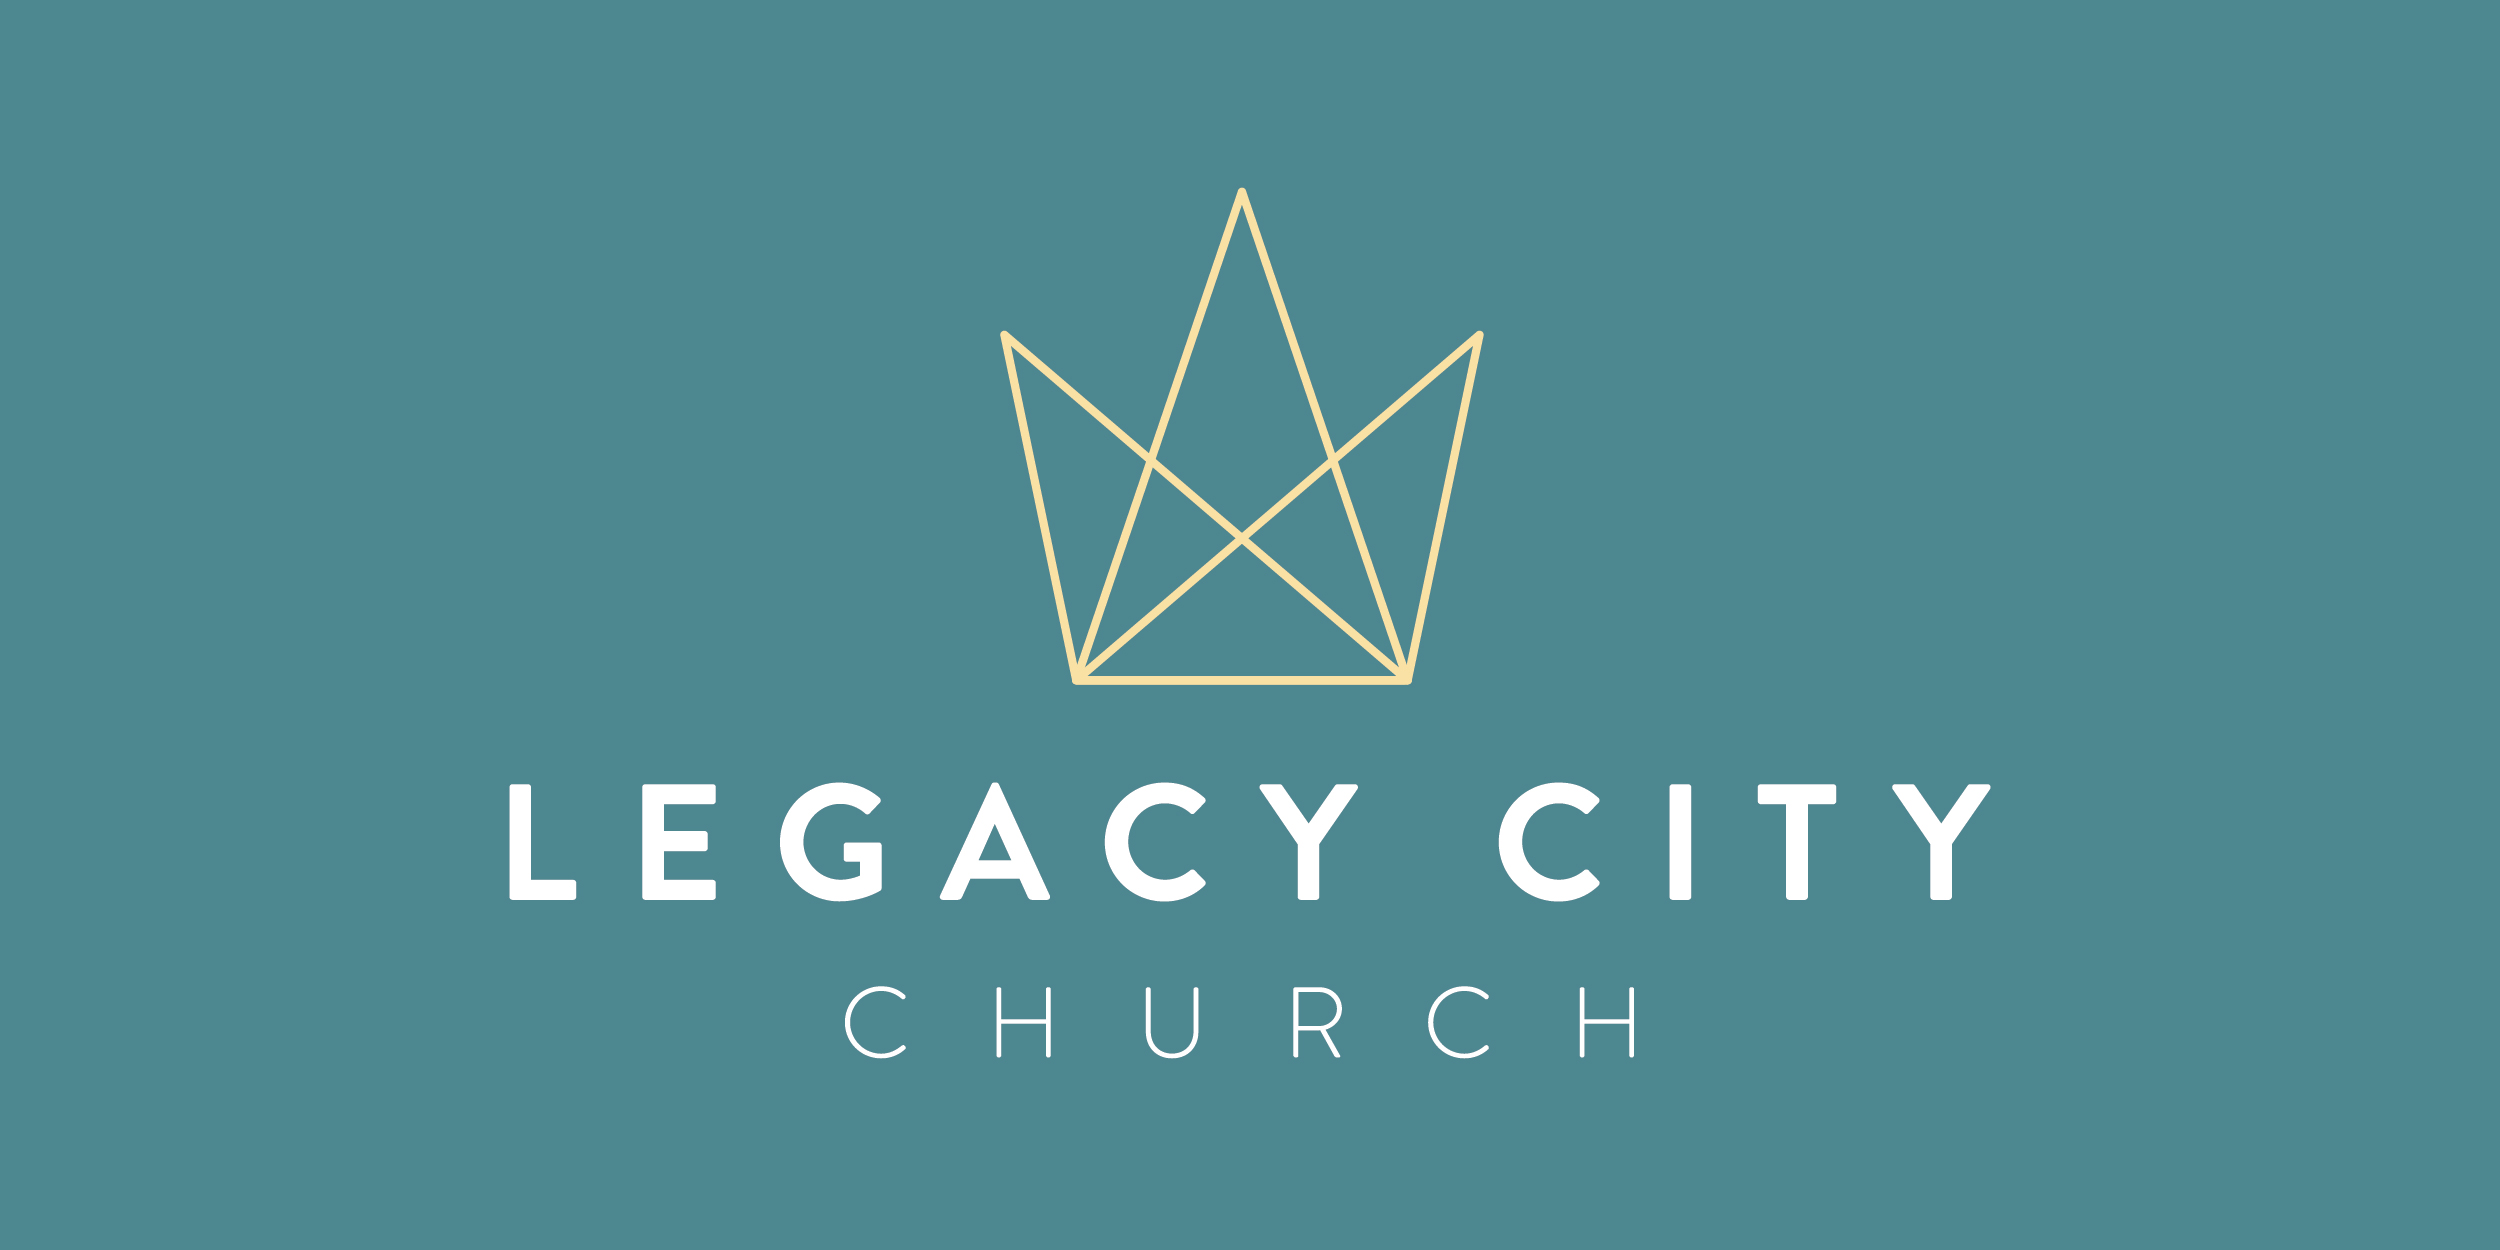 legacy_city-01.jpg